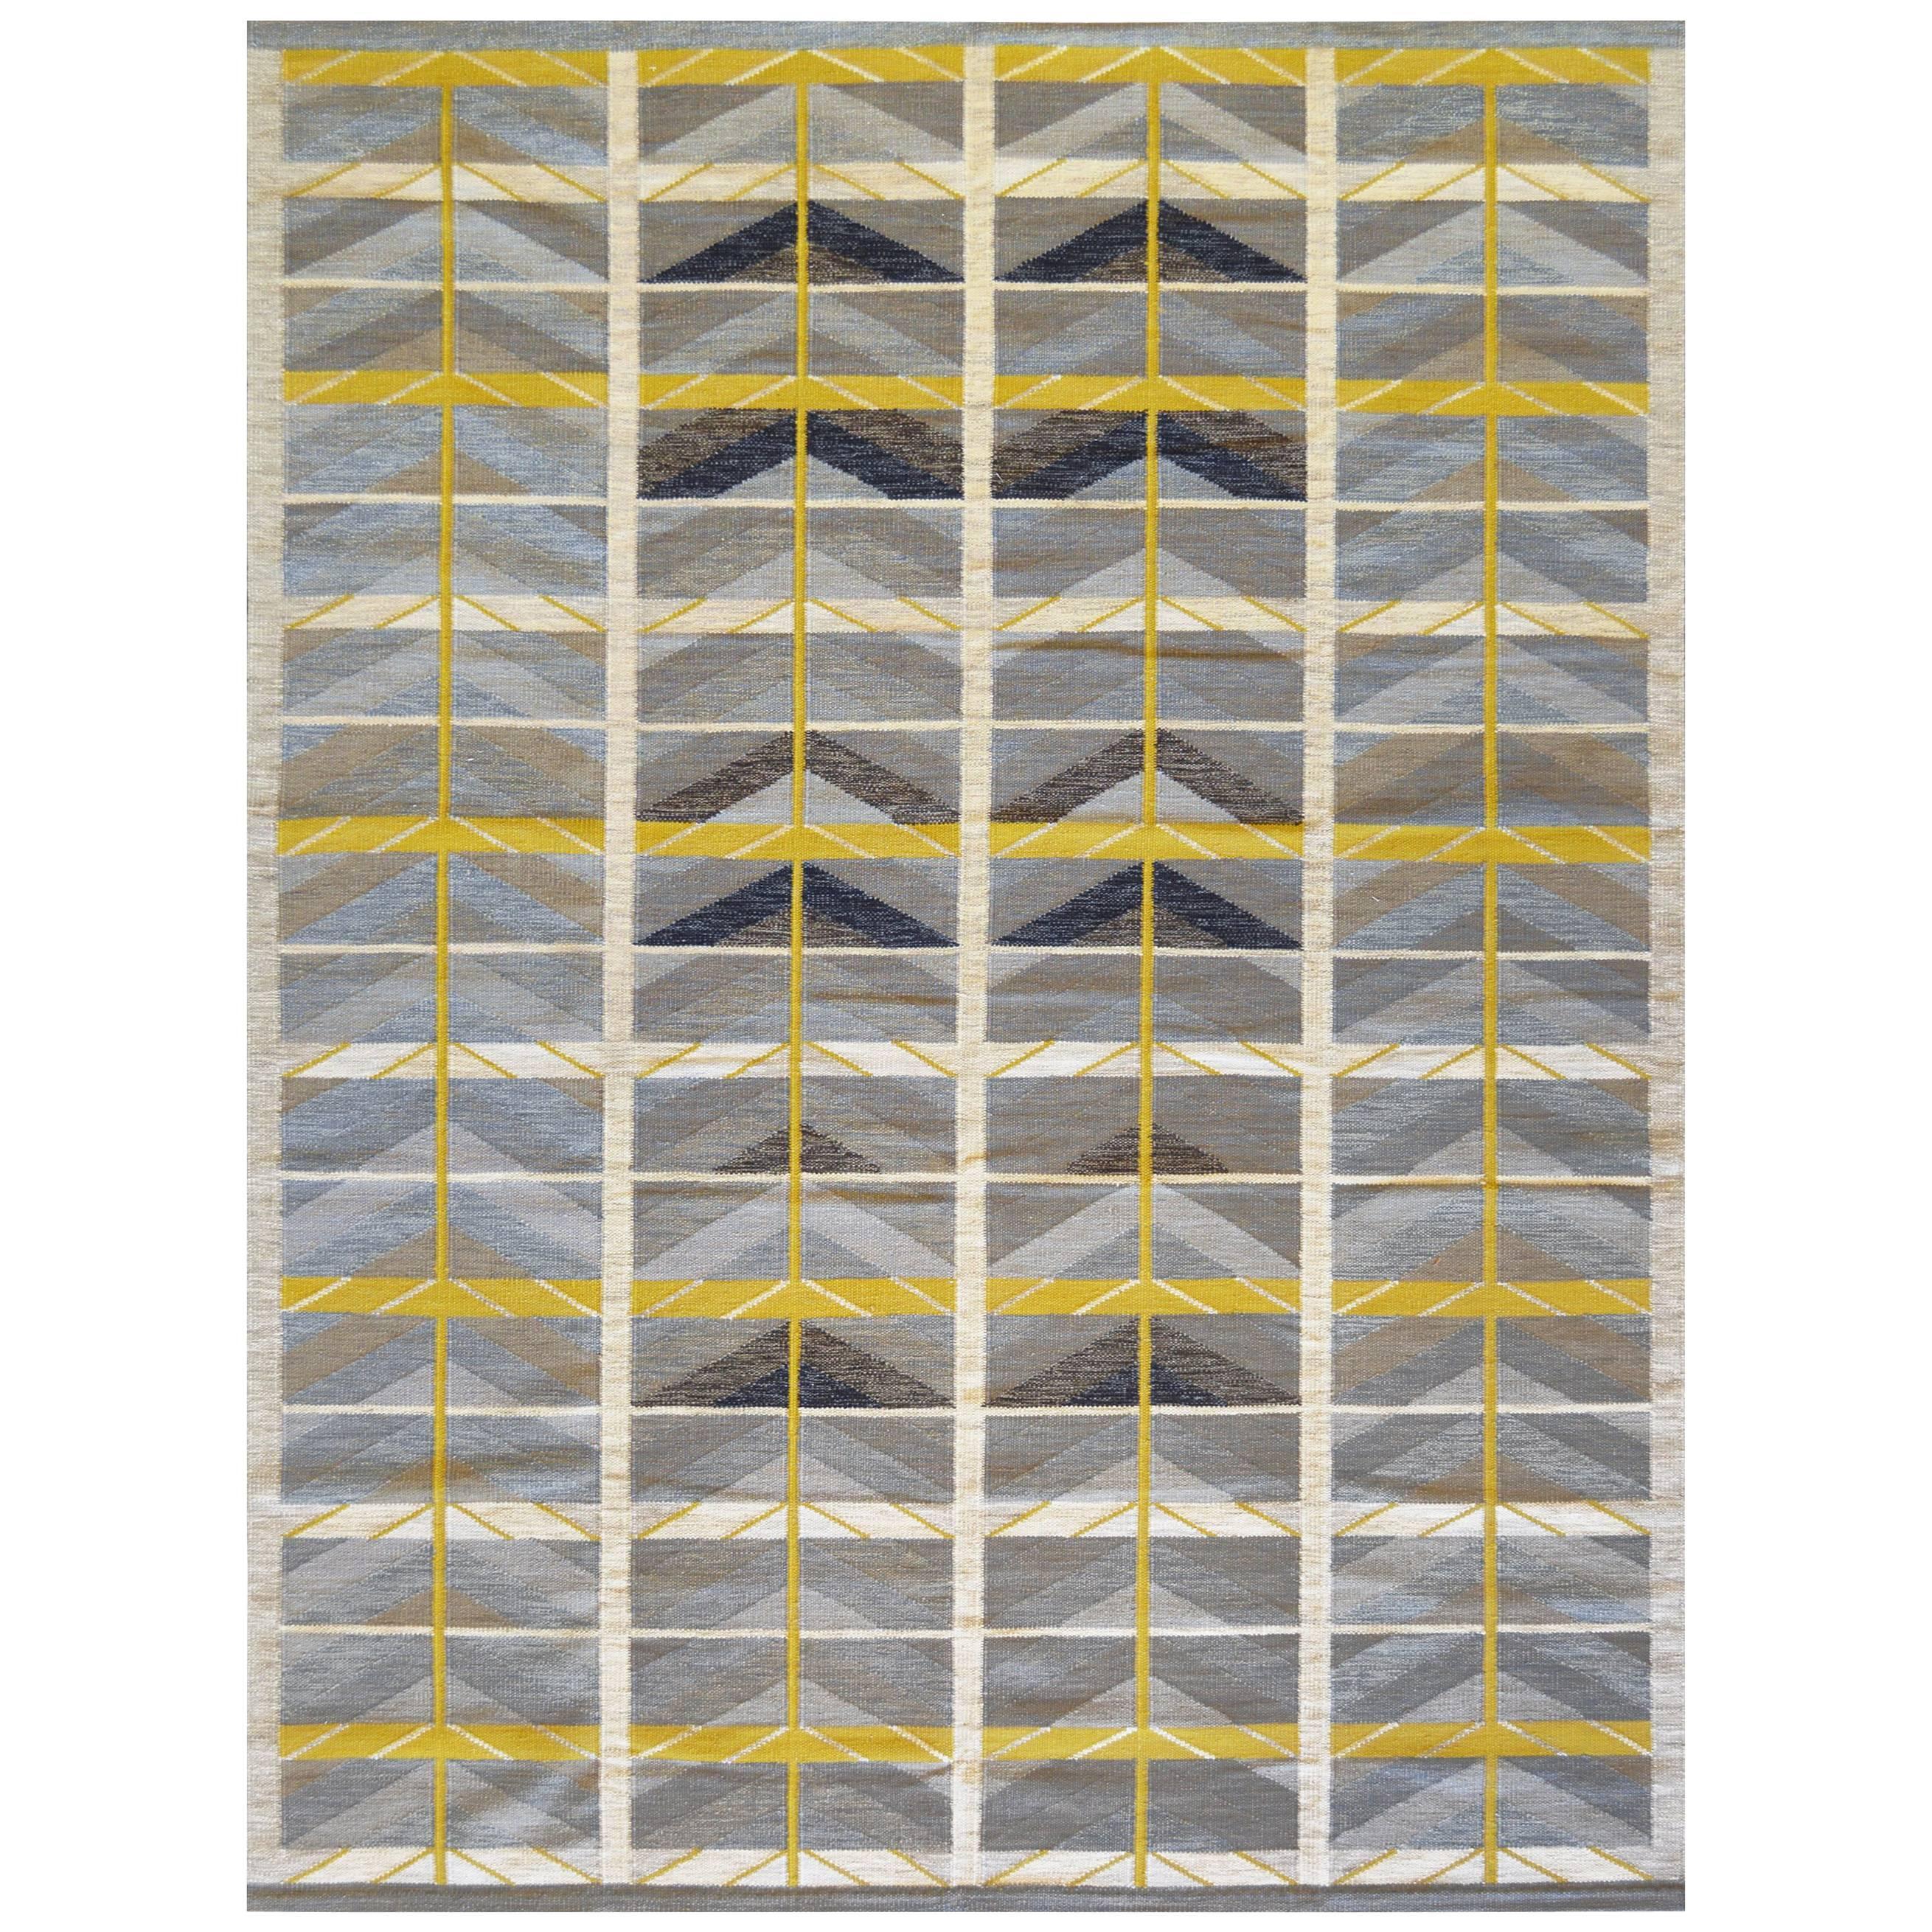 Swedish Flat Weave Rug